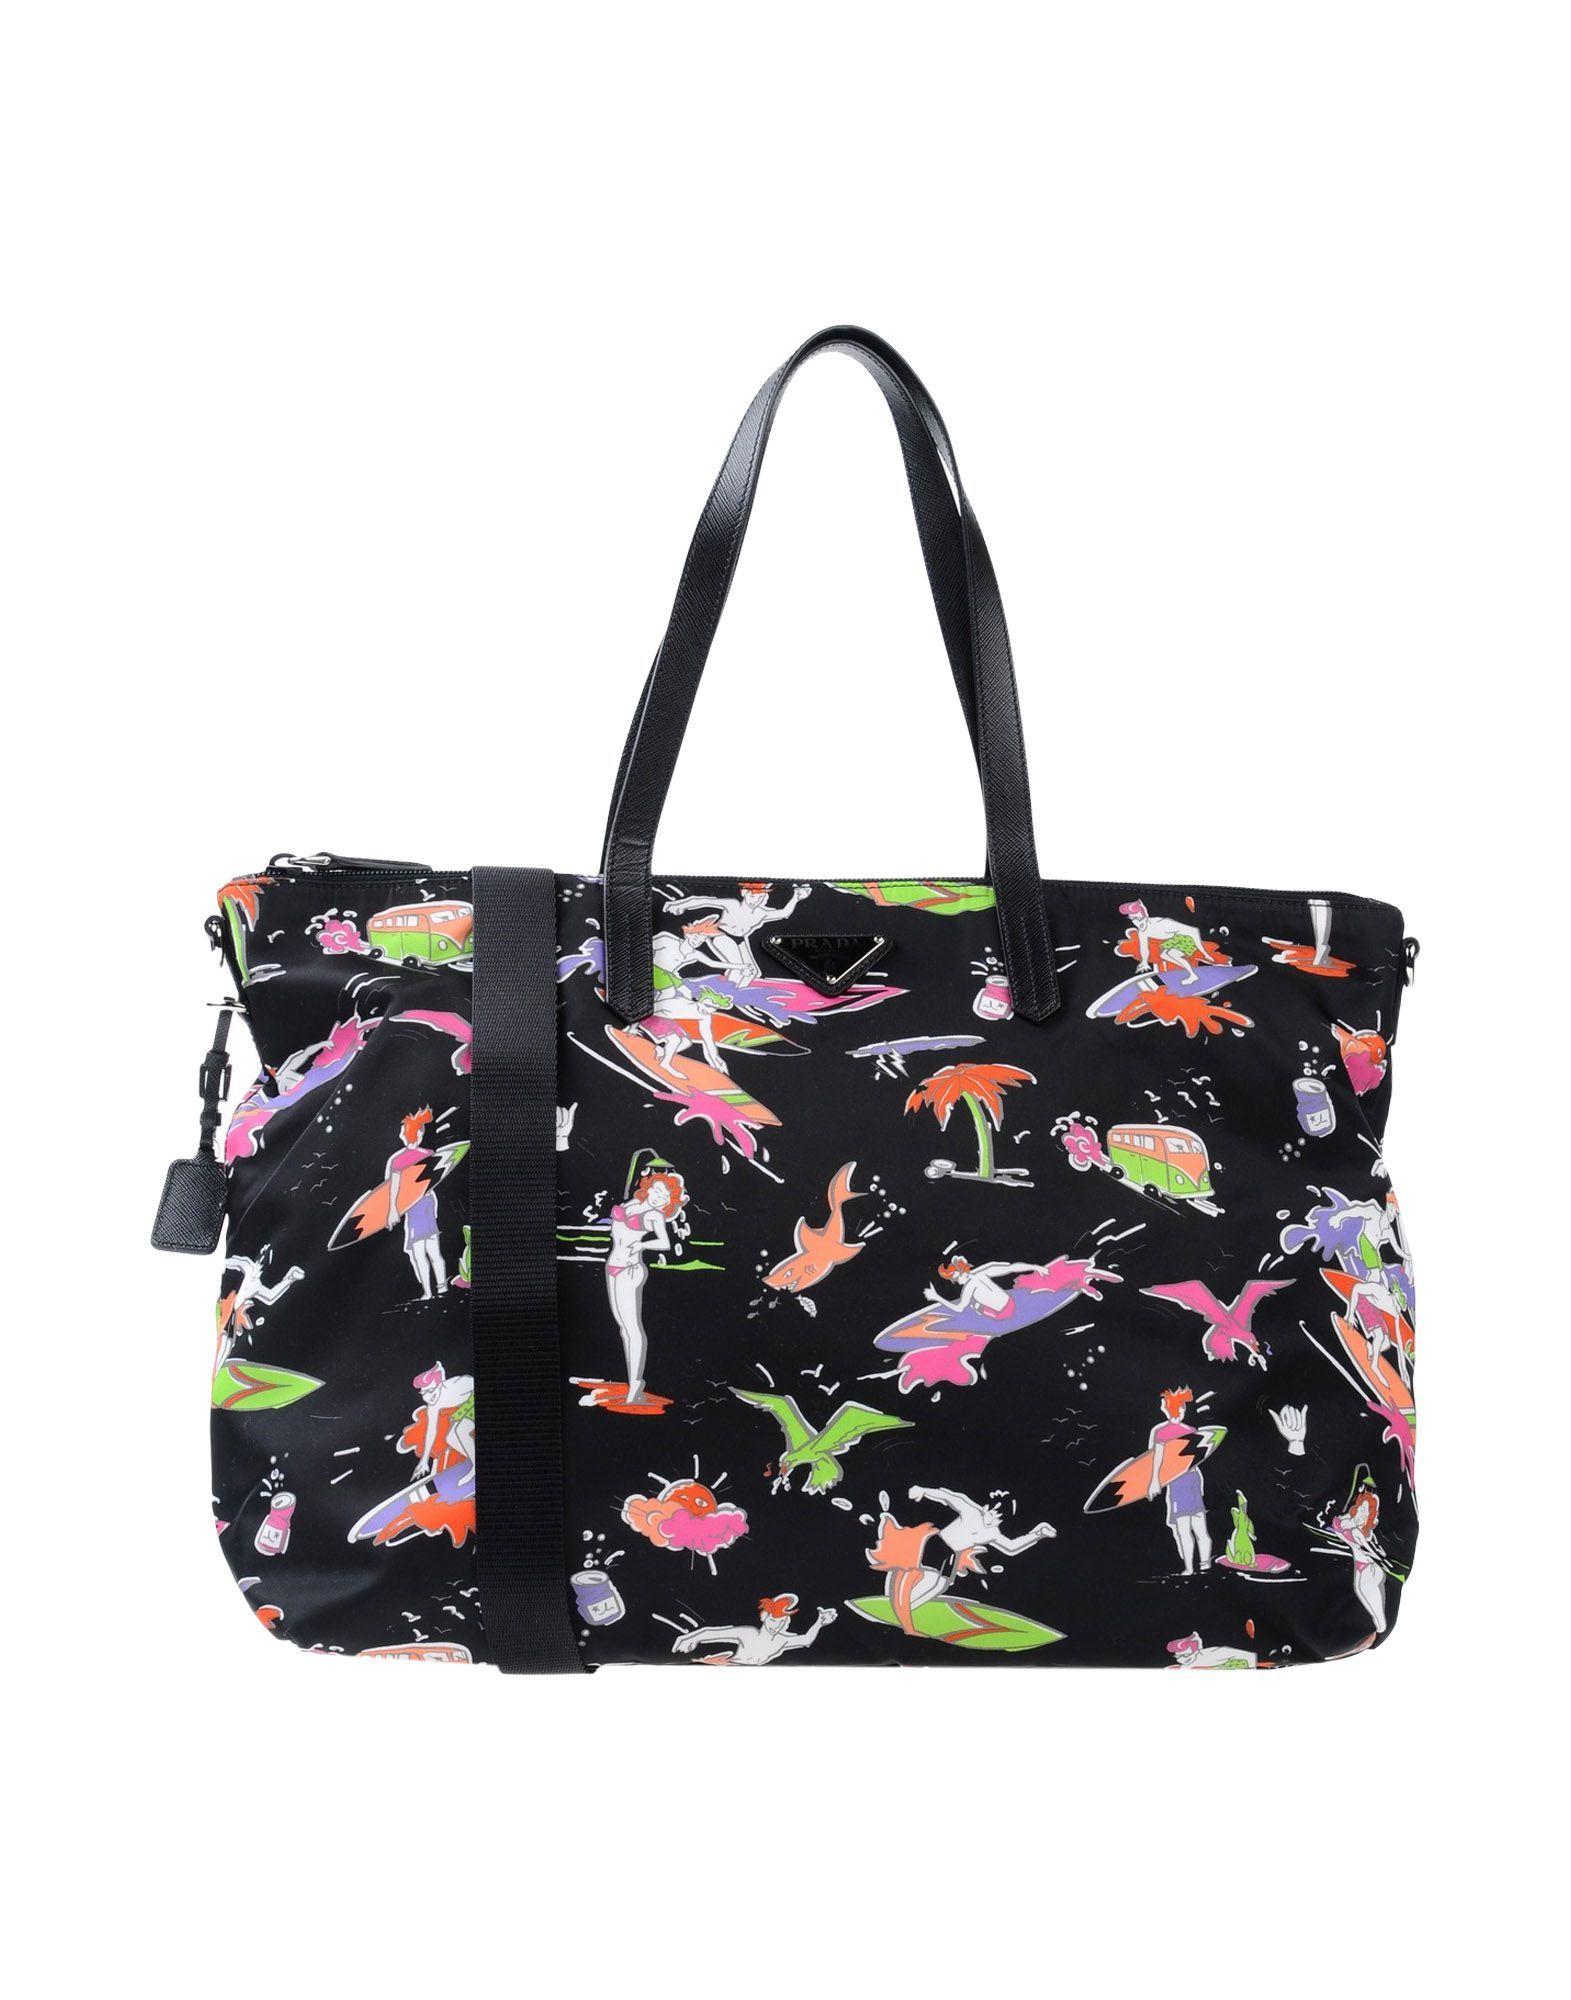 4538b2ac5463 low cost prada shoulder bag prada handbag 0d4d7 07c57; greece prada handbag  prada women handbag on yoox. the best online selection of handbags prada